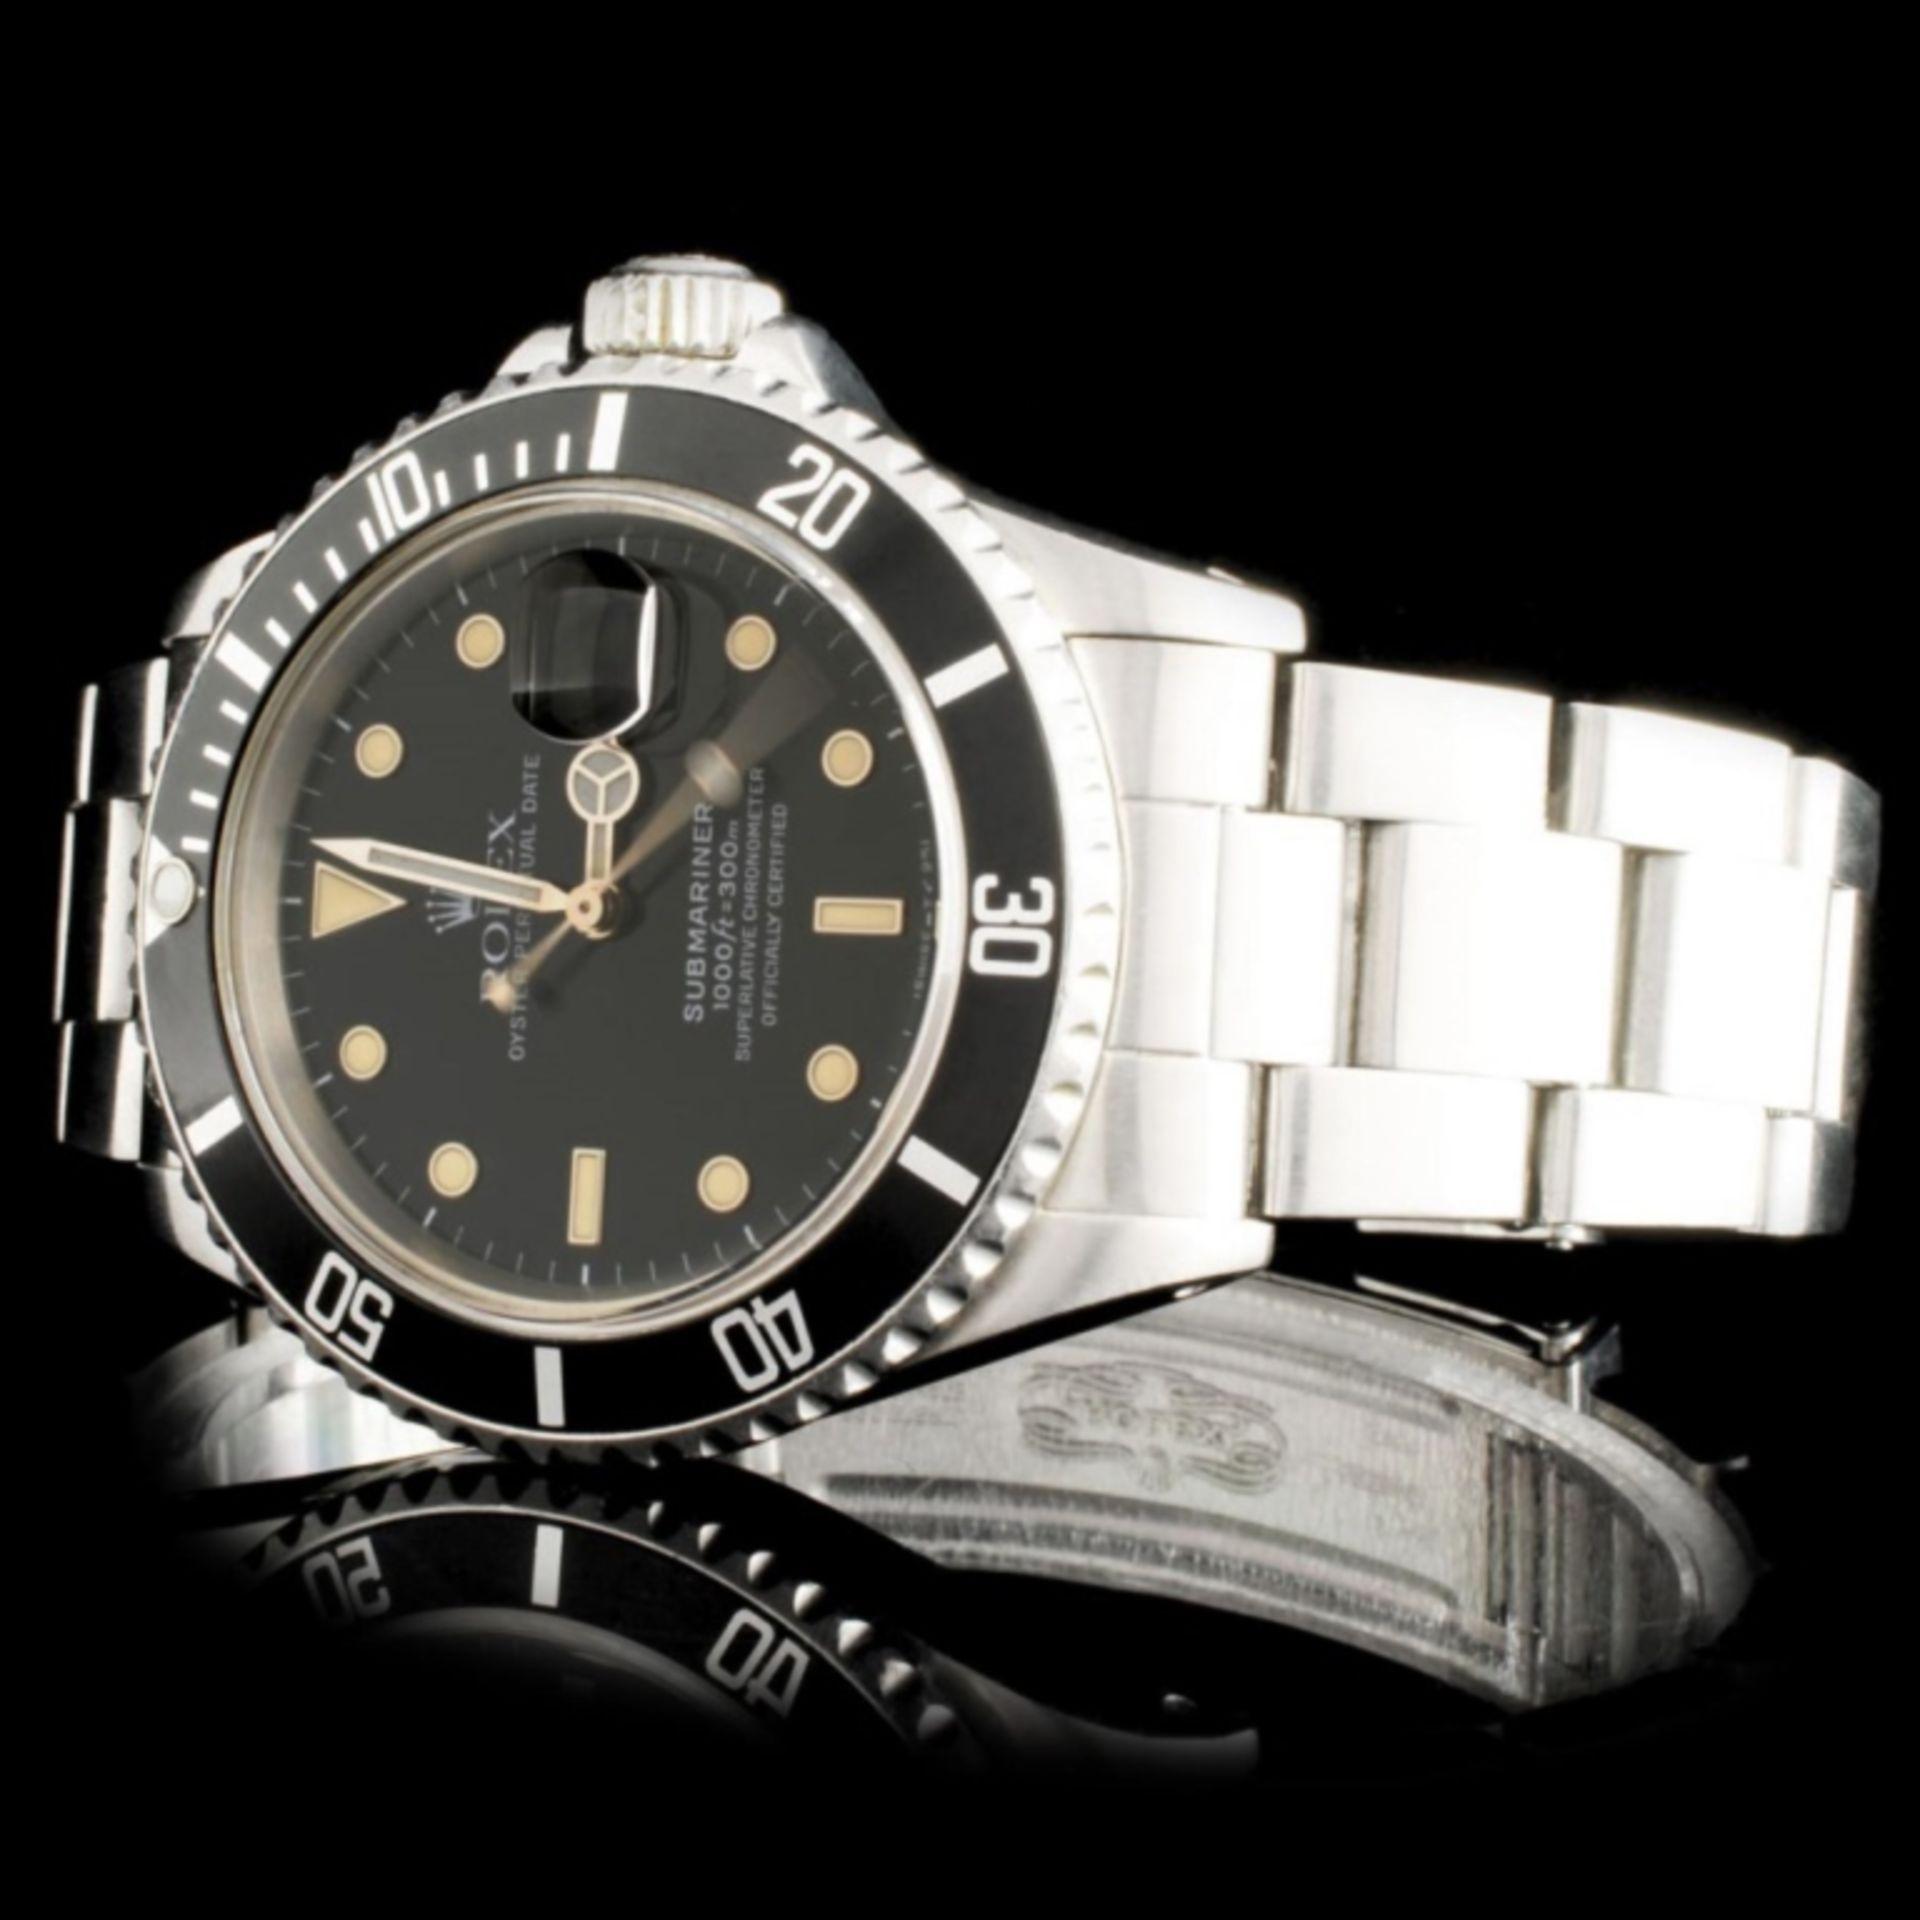 Rolex SS Submariner 40MM Wristwatch - Image 2 of 5